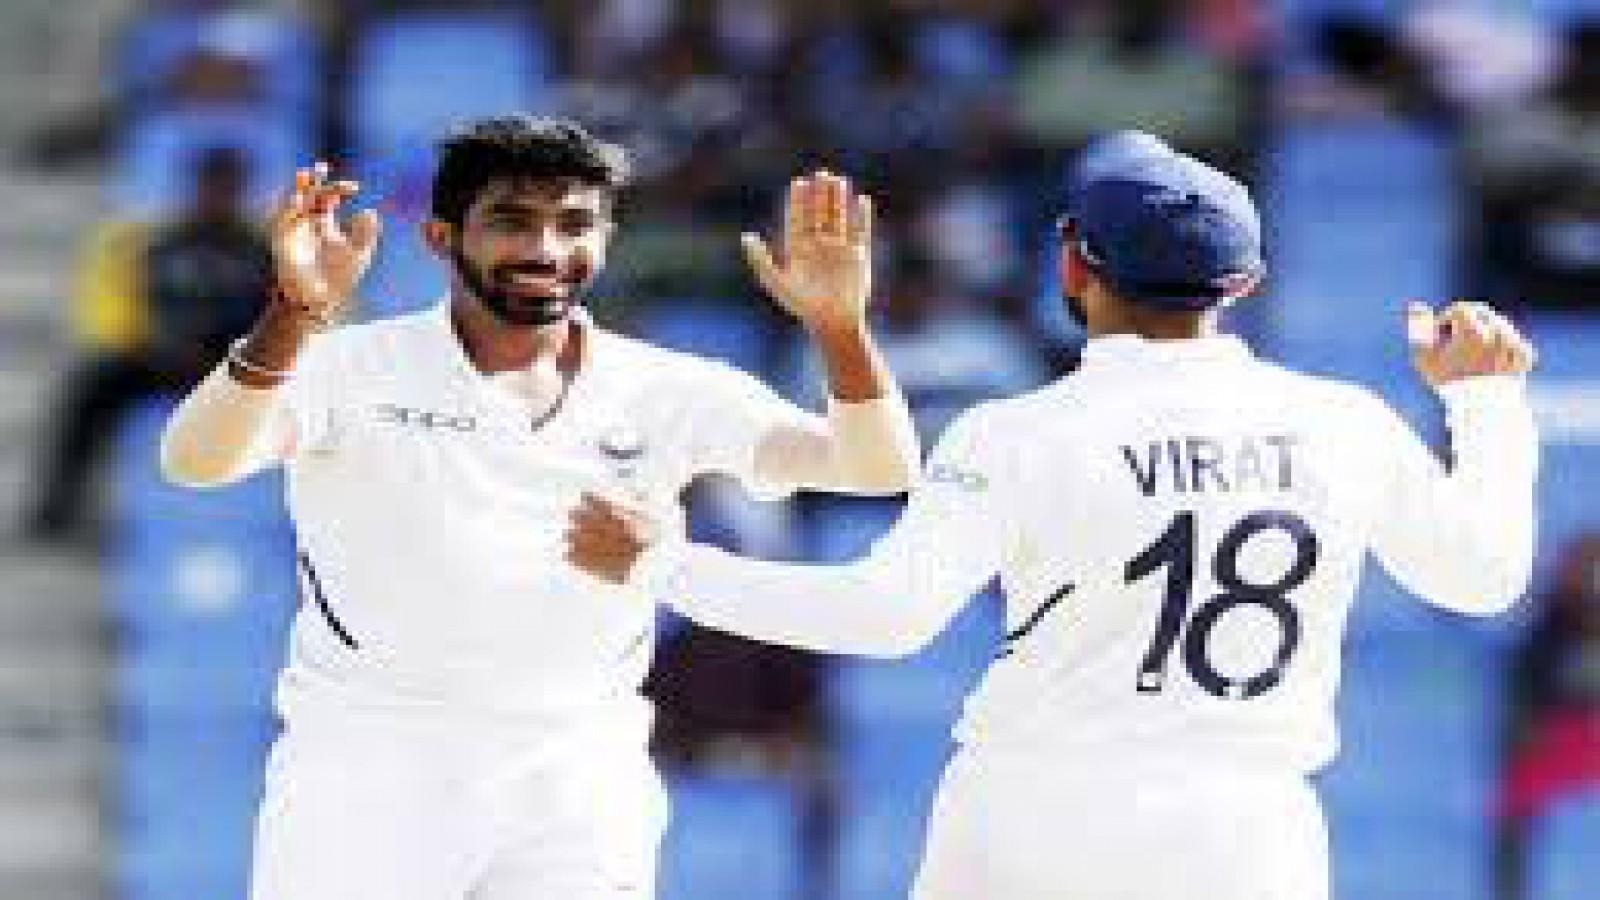 jasprit-bumrah-the-most-complete-bowler-around-says-virat-kohli